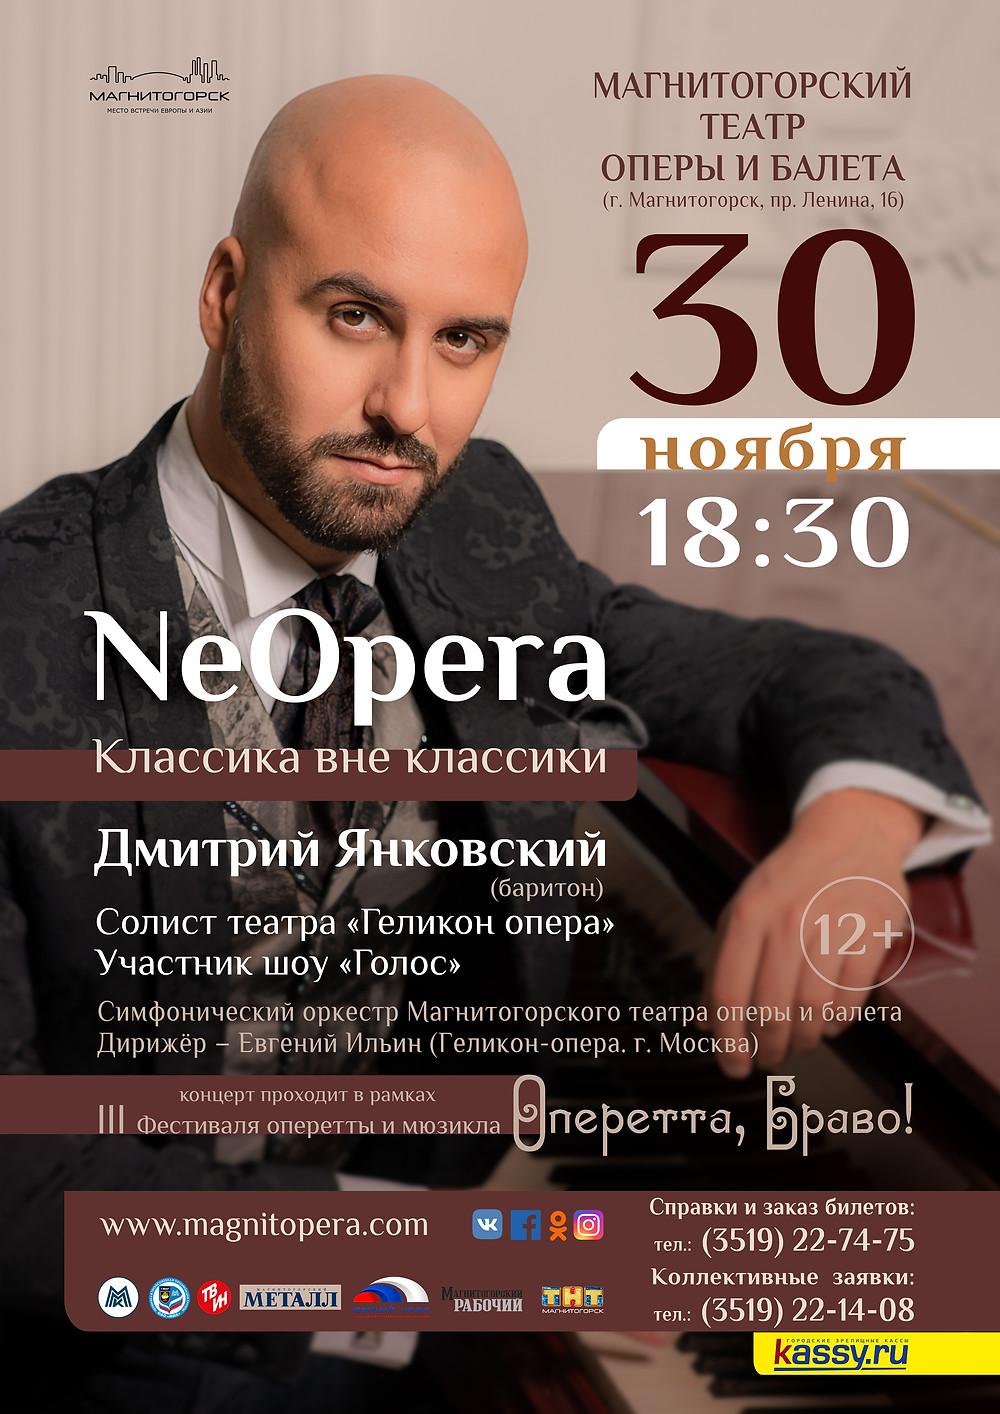 http://magnitopera.com/afisha/16/1267-III-festival-operetta-bravo-kontsert-NeOpera-klassika-vne-klassiki-dmitrij-yankovskij-bariton-g-moskva-simfonicheskij-orkestr-mtoib-dirizher-evgenij-ilin-g-moskva-30-noyabrya-18-30ch-12/